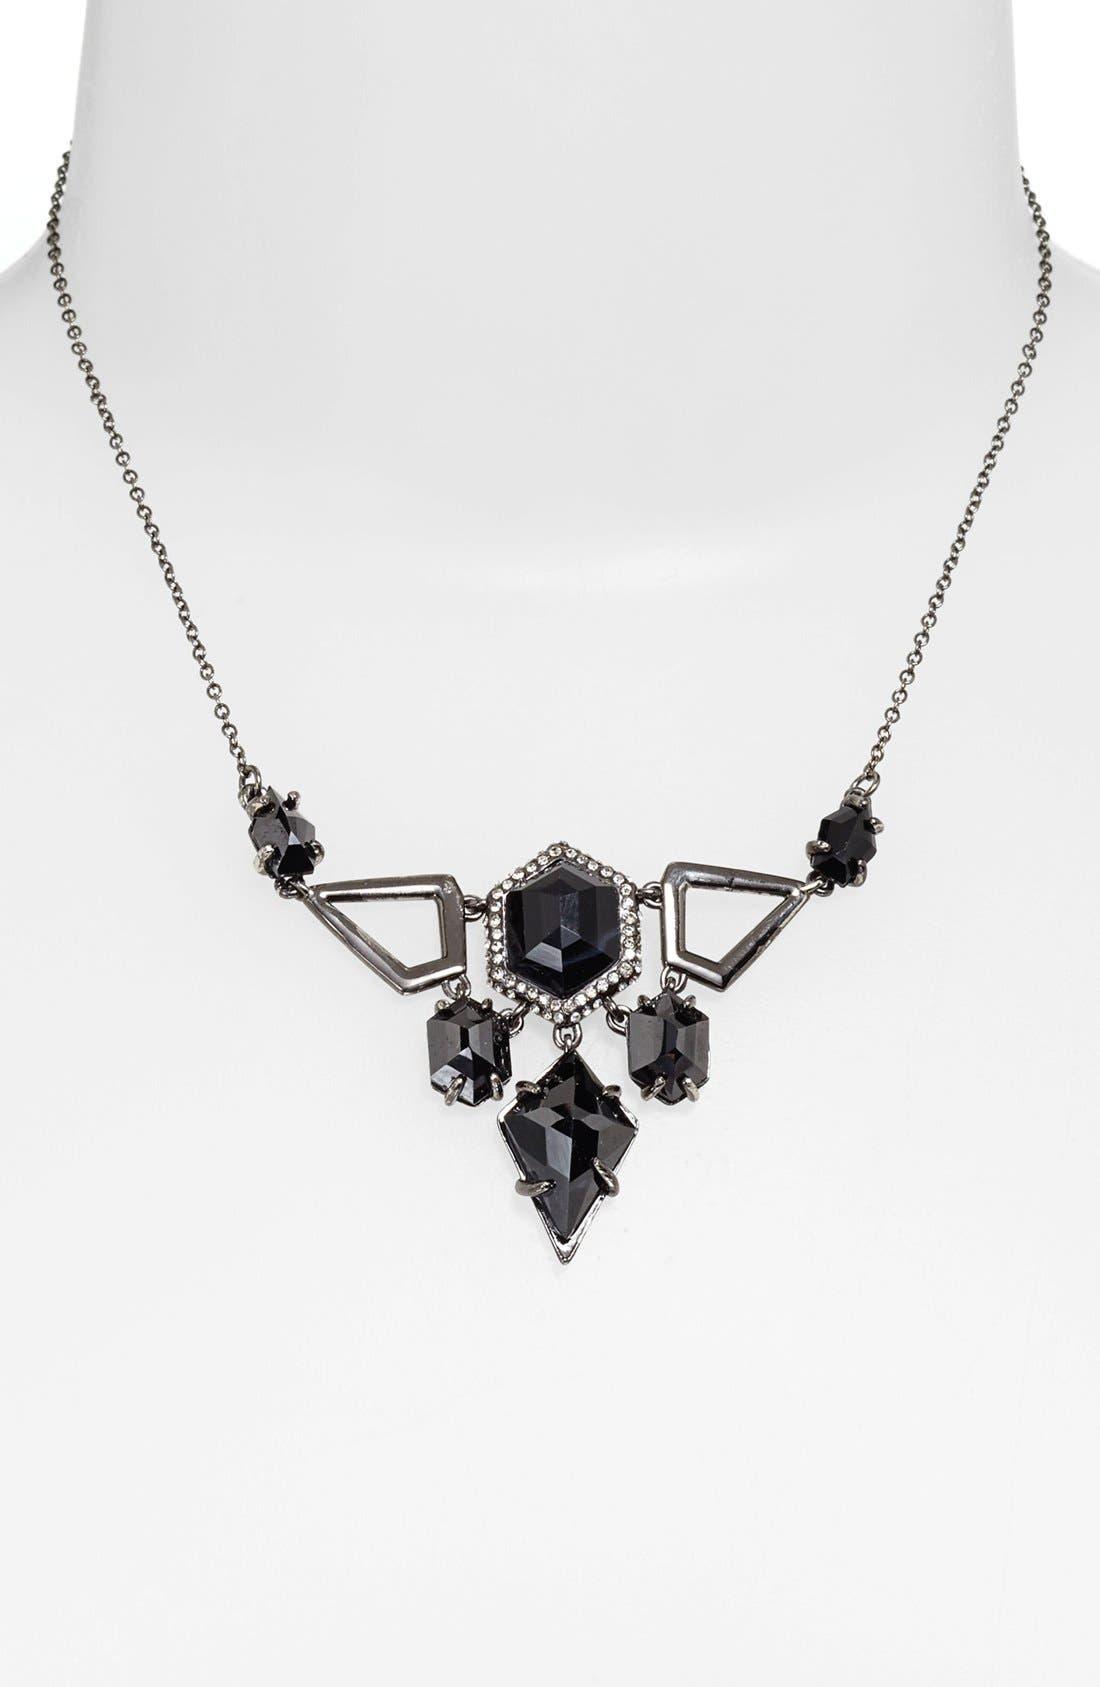 Main Image - Alexis Bittar 'Miss Havisham - Pavo' Articulated Pendant Necklace